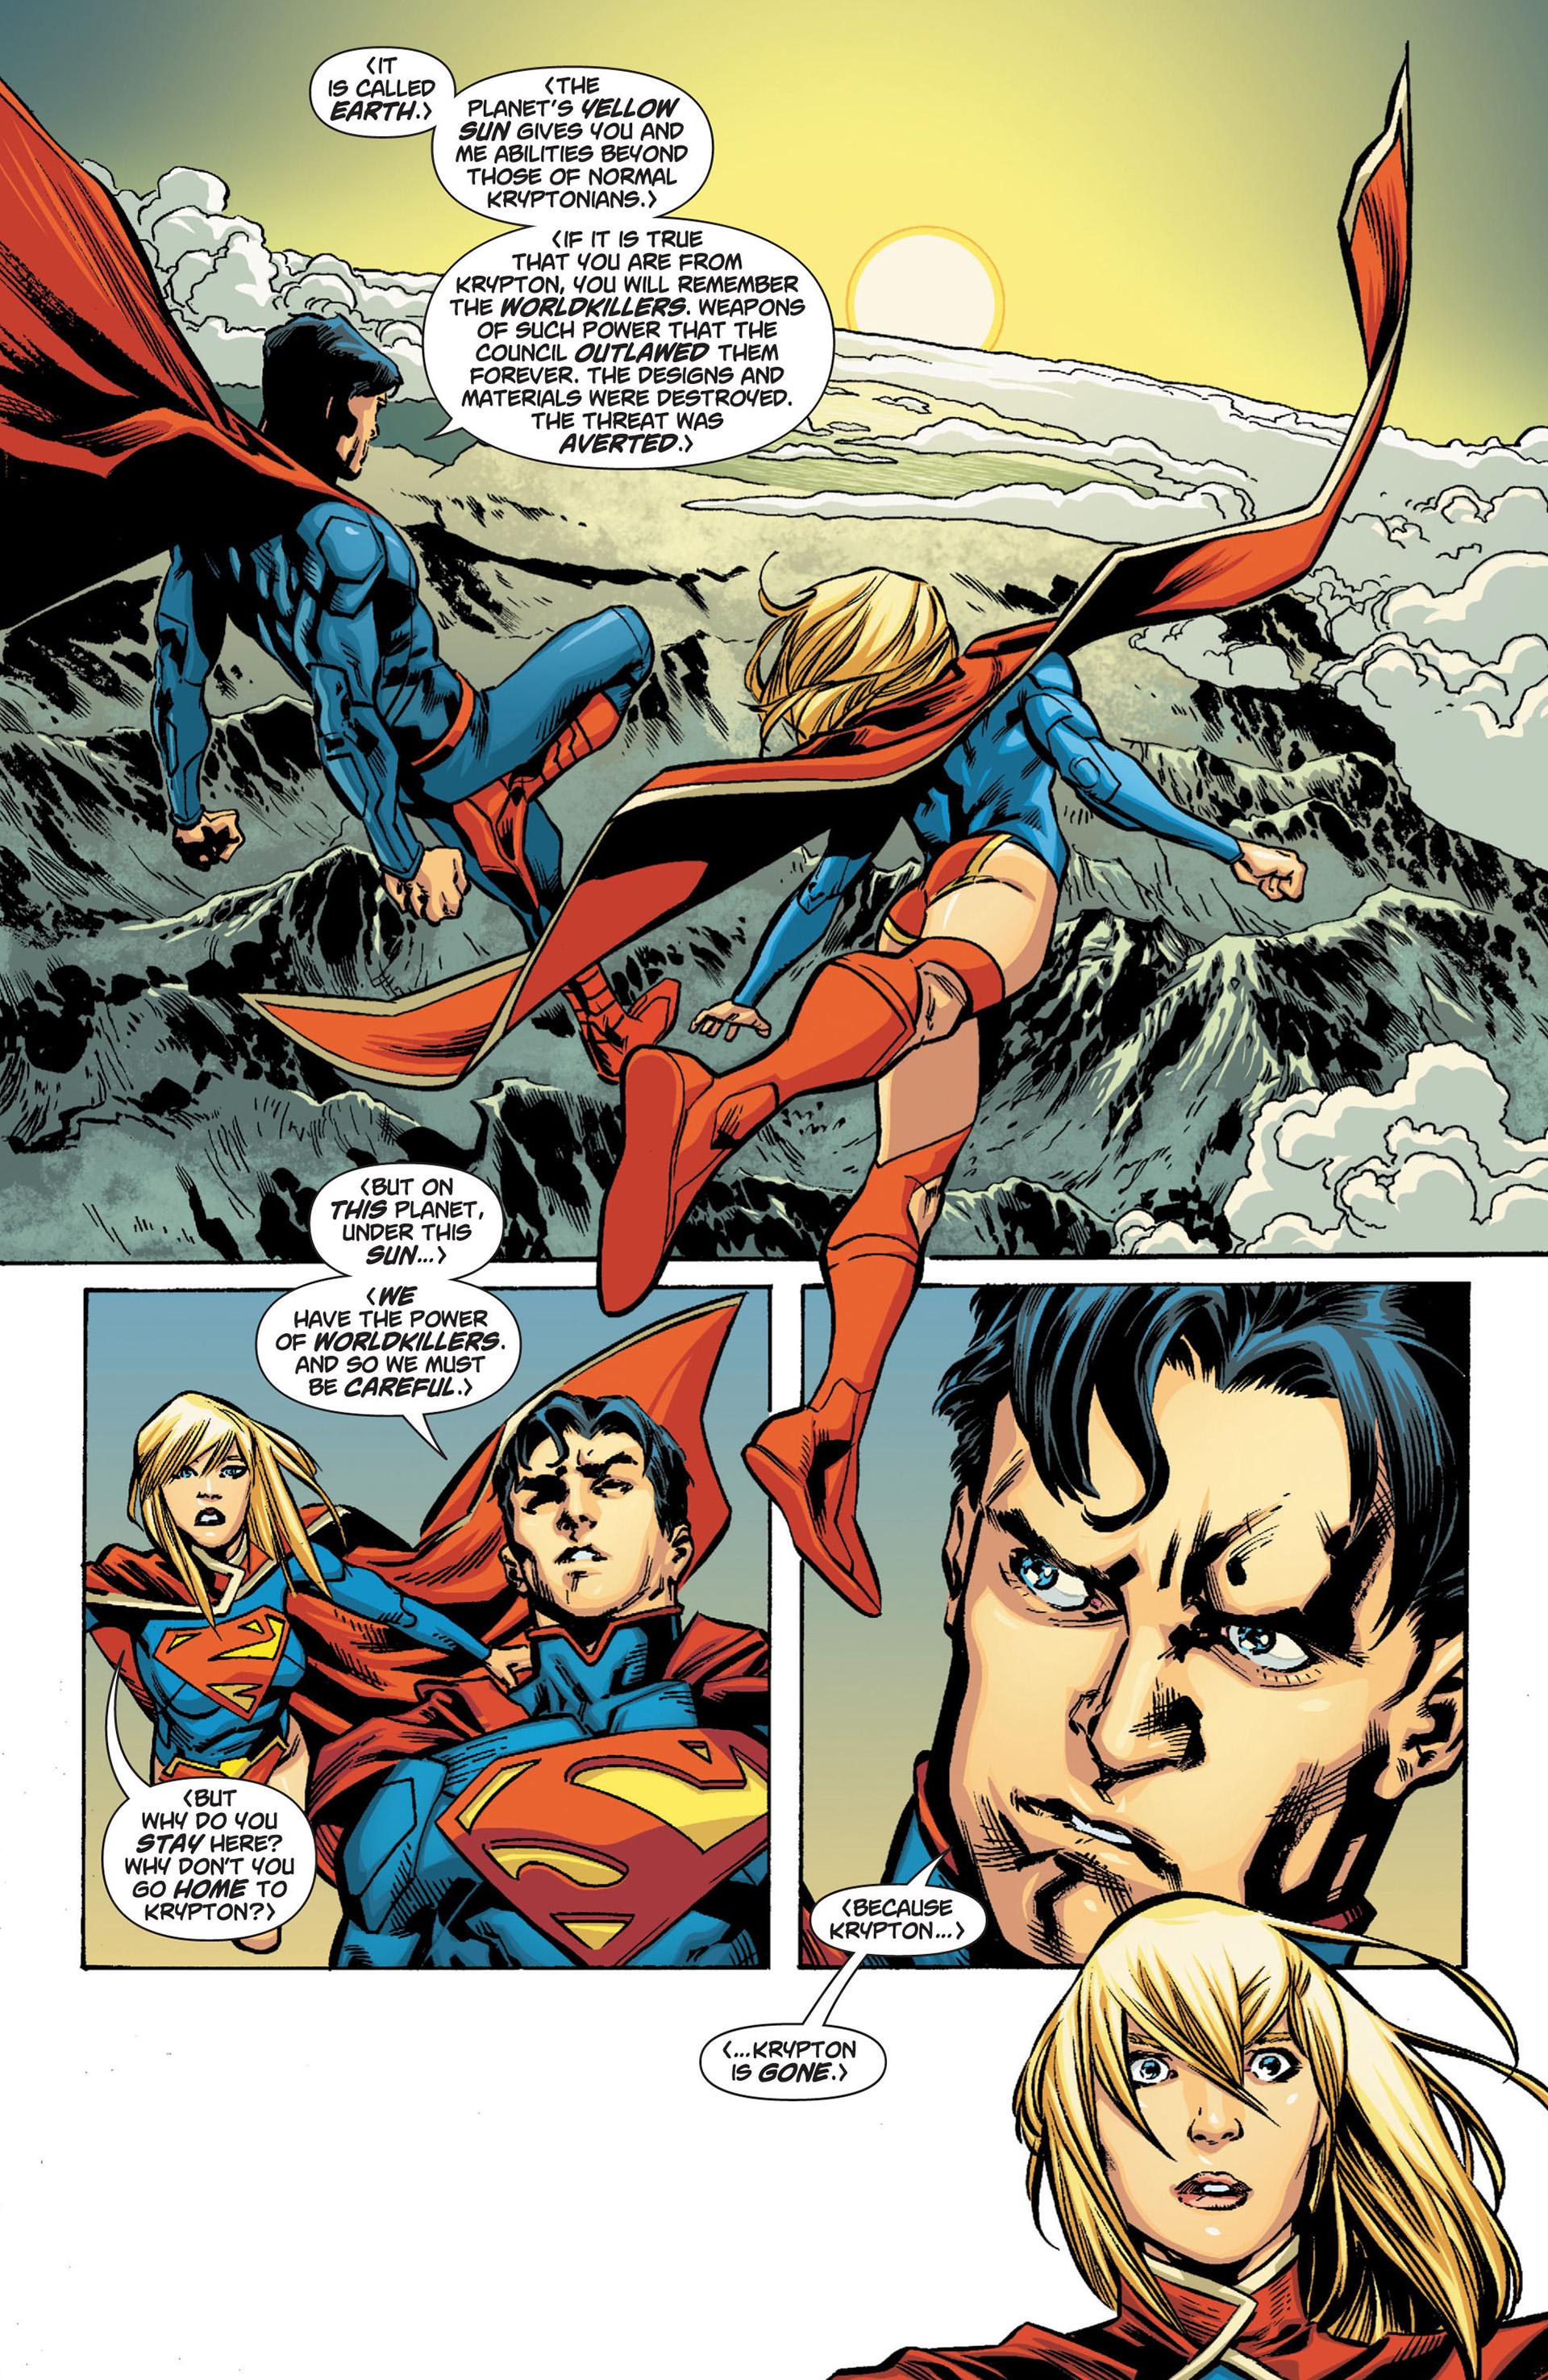 Supergirl (2011) Issue #2 #4 - English 20